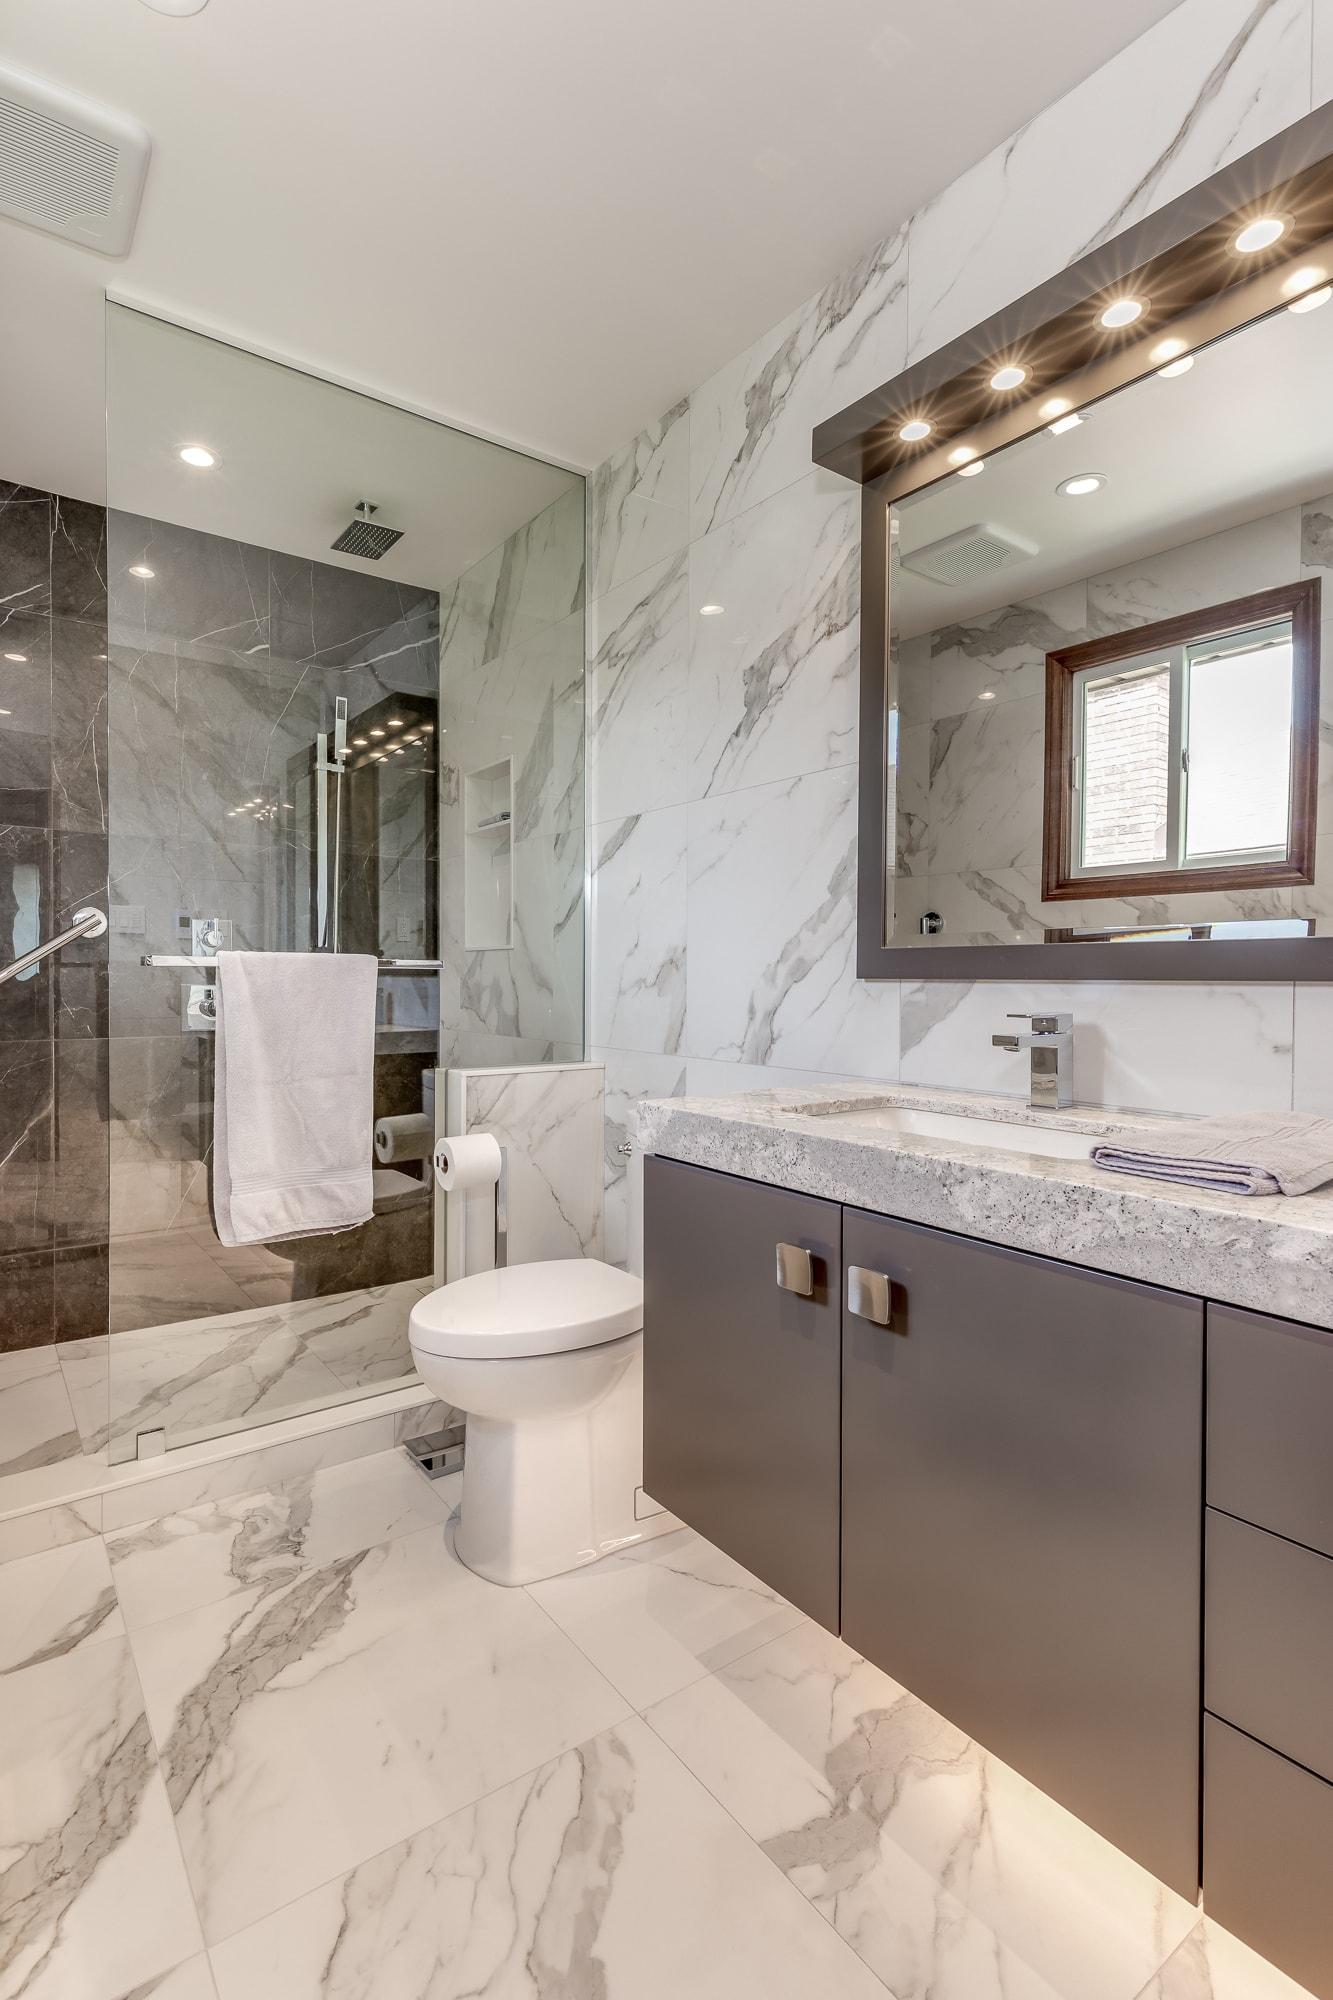 Design Collection Marvelous Bathroom Design Ideas Photo Gallery 50 New Inspiration